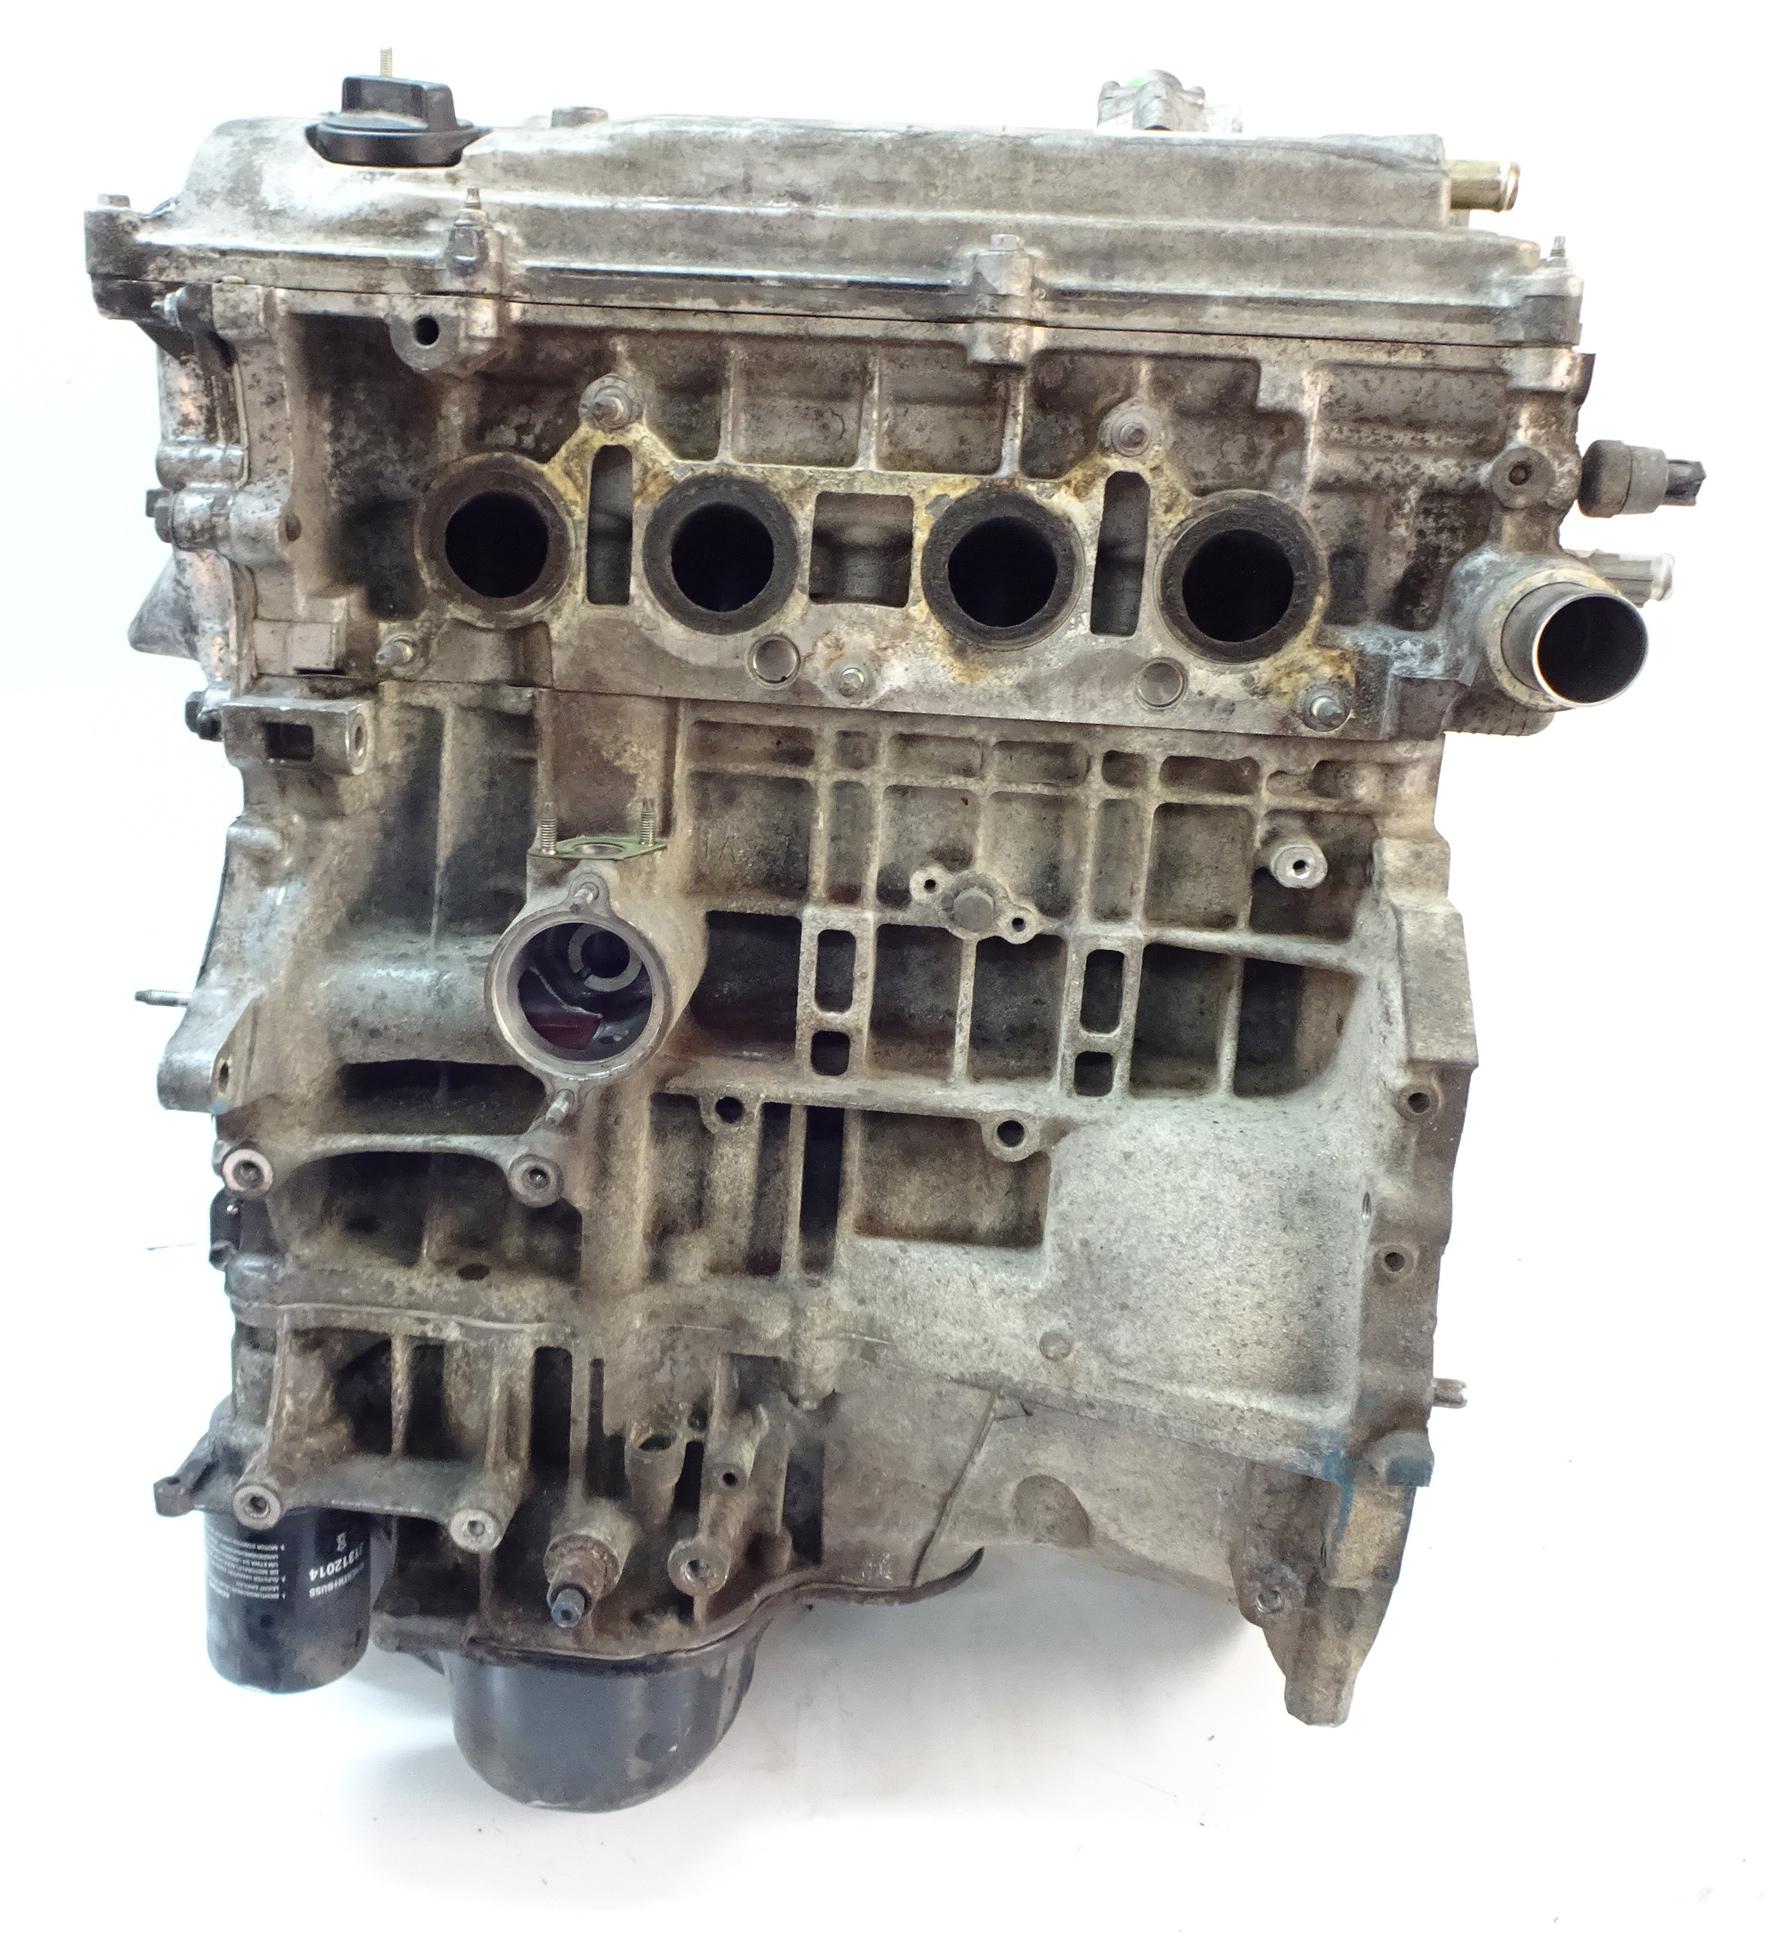 Motor 2004 für Toyota Avensis T22 T25 2,0 VVT-i 1AZ-FSE 1AZ